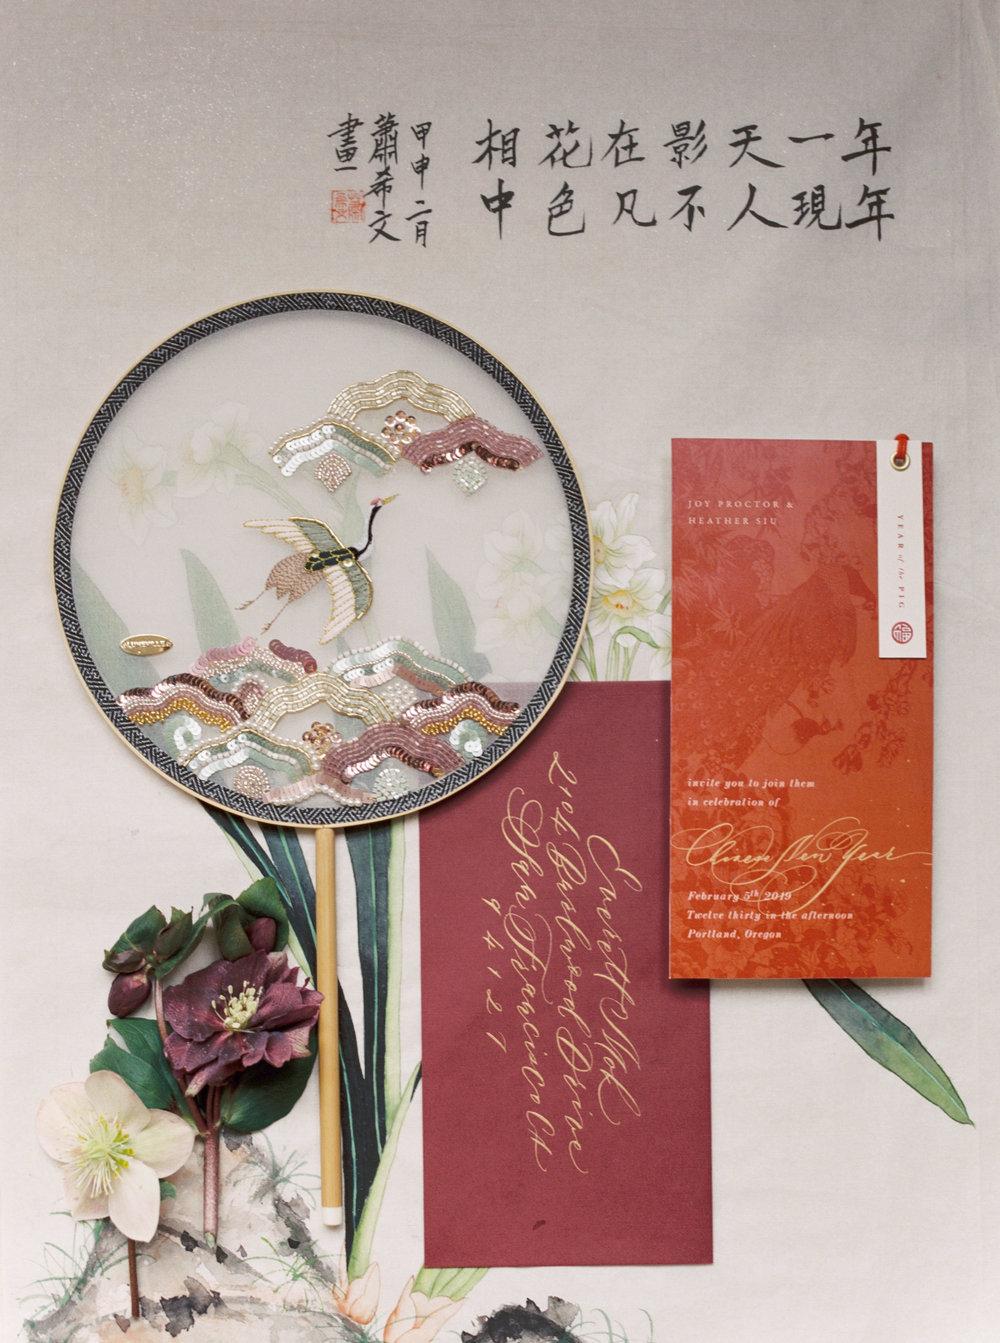 Carlos-Hernandez-Wedding-Film-Photography-Chinese-Year-Celebration-With-Joy-Proctor-011.jpg